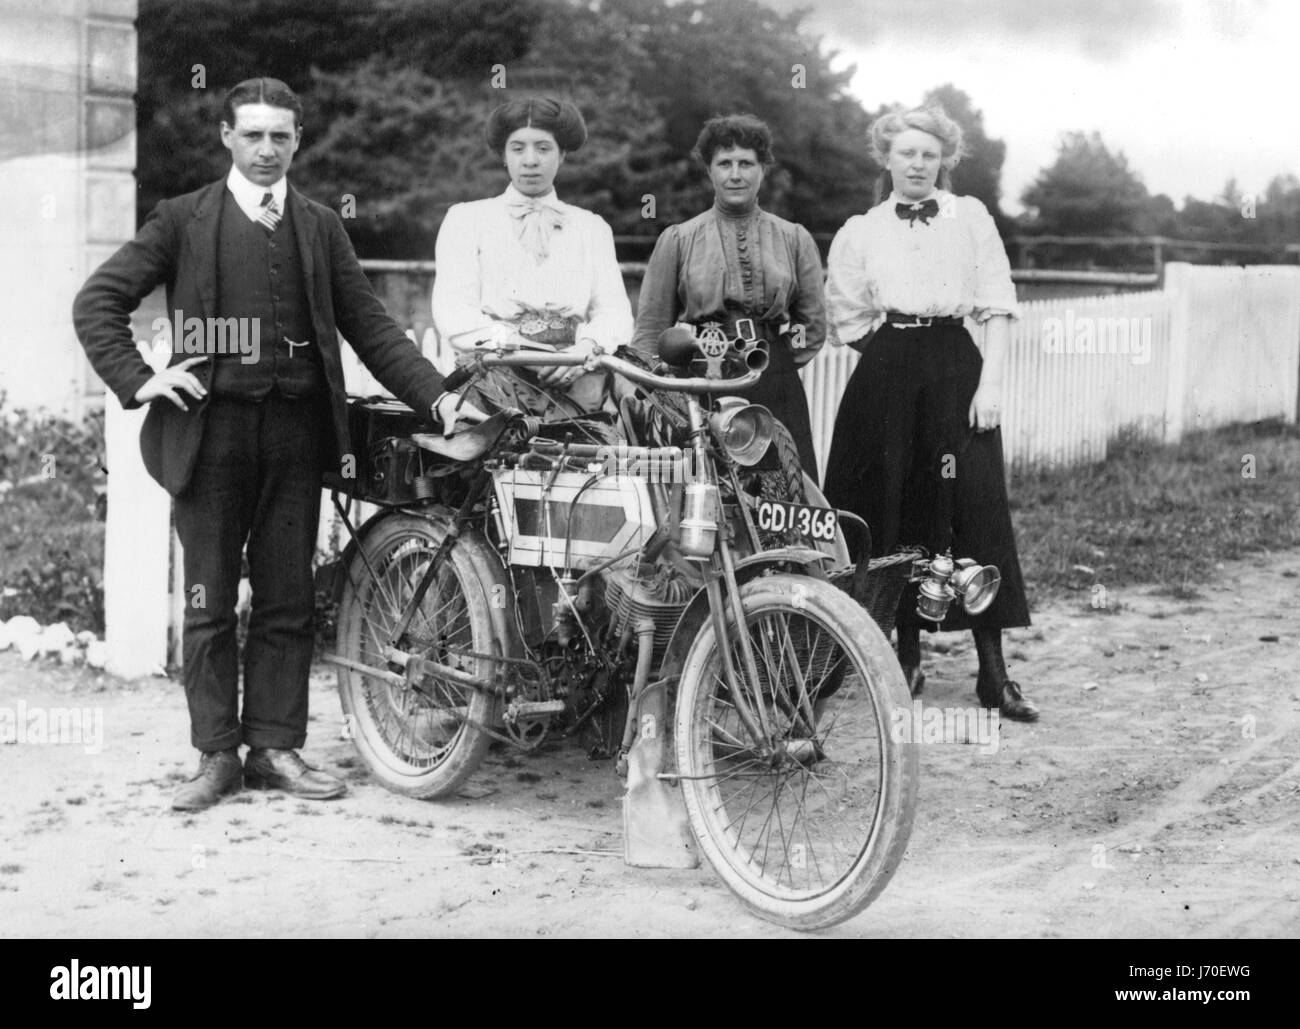 1911 Minerva 3.5 hp motorcycle - Stock Image